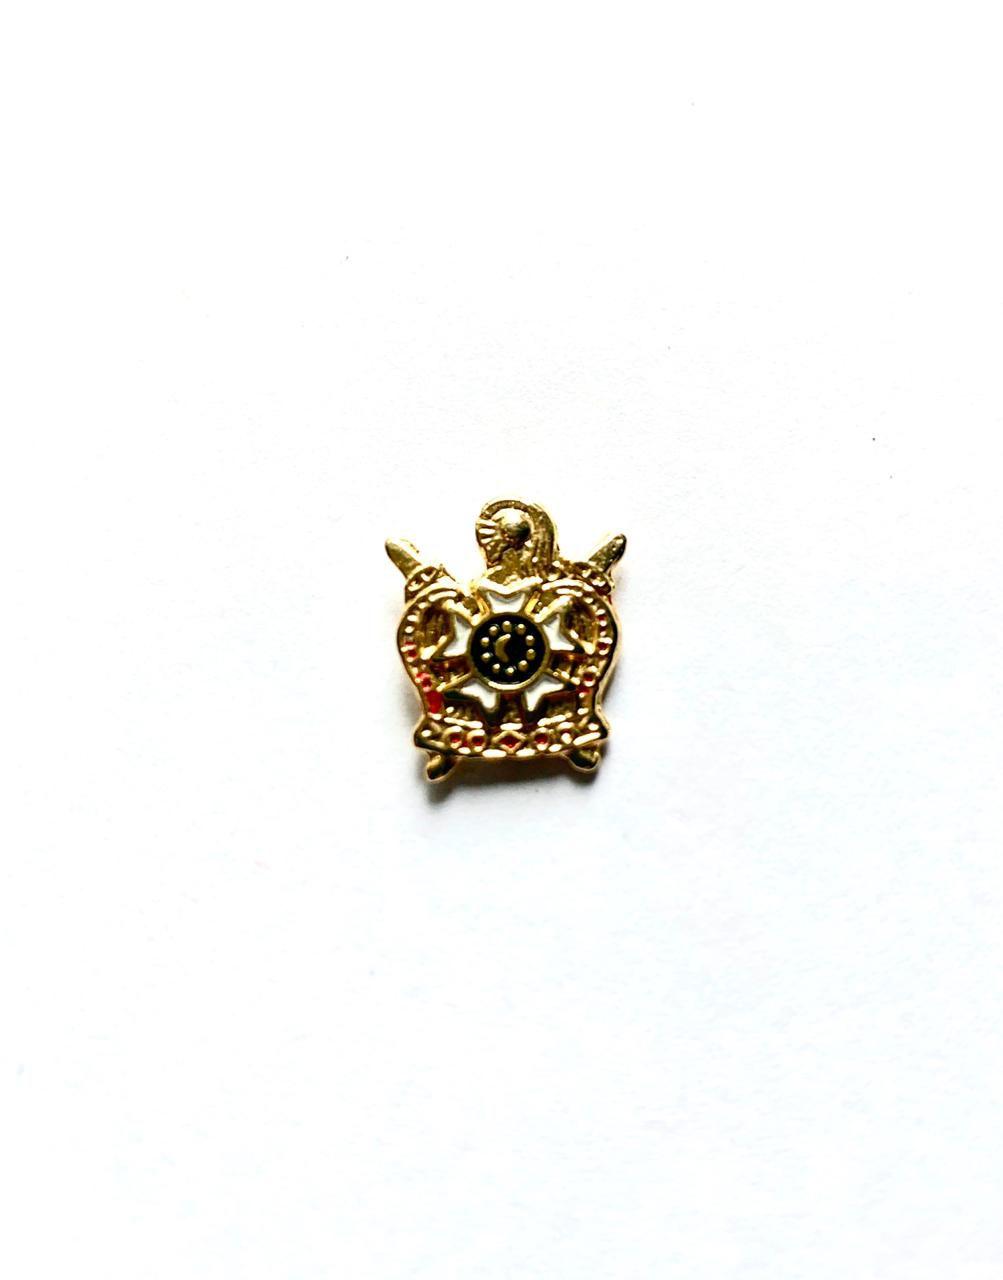 Pin DM - Pequeno - 1,5 x 1,5 cm